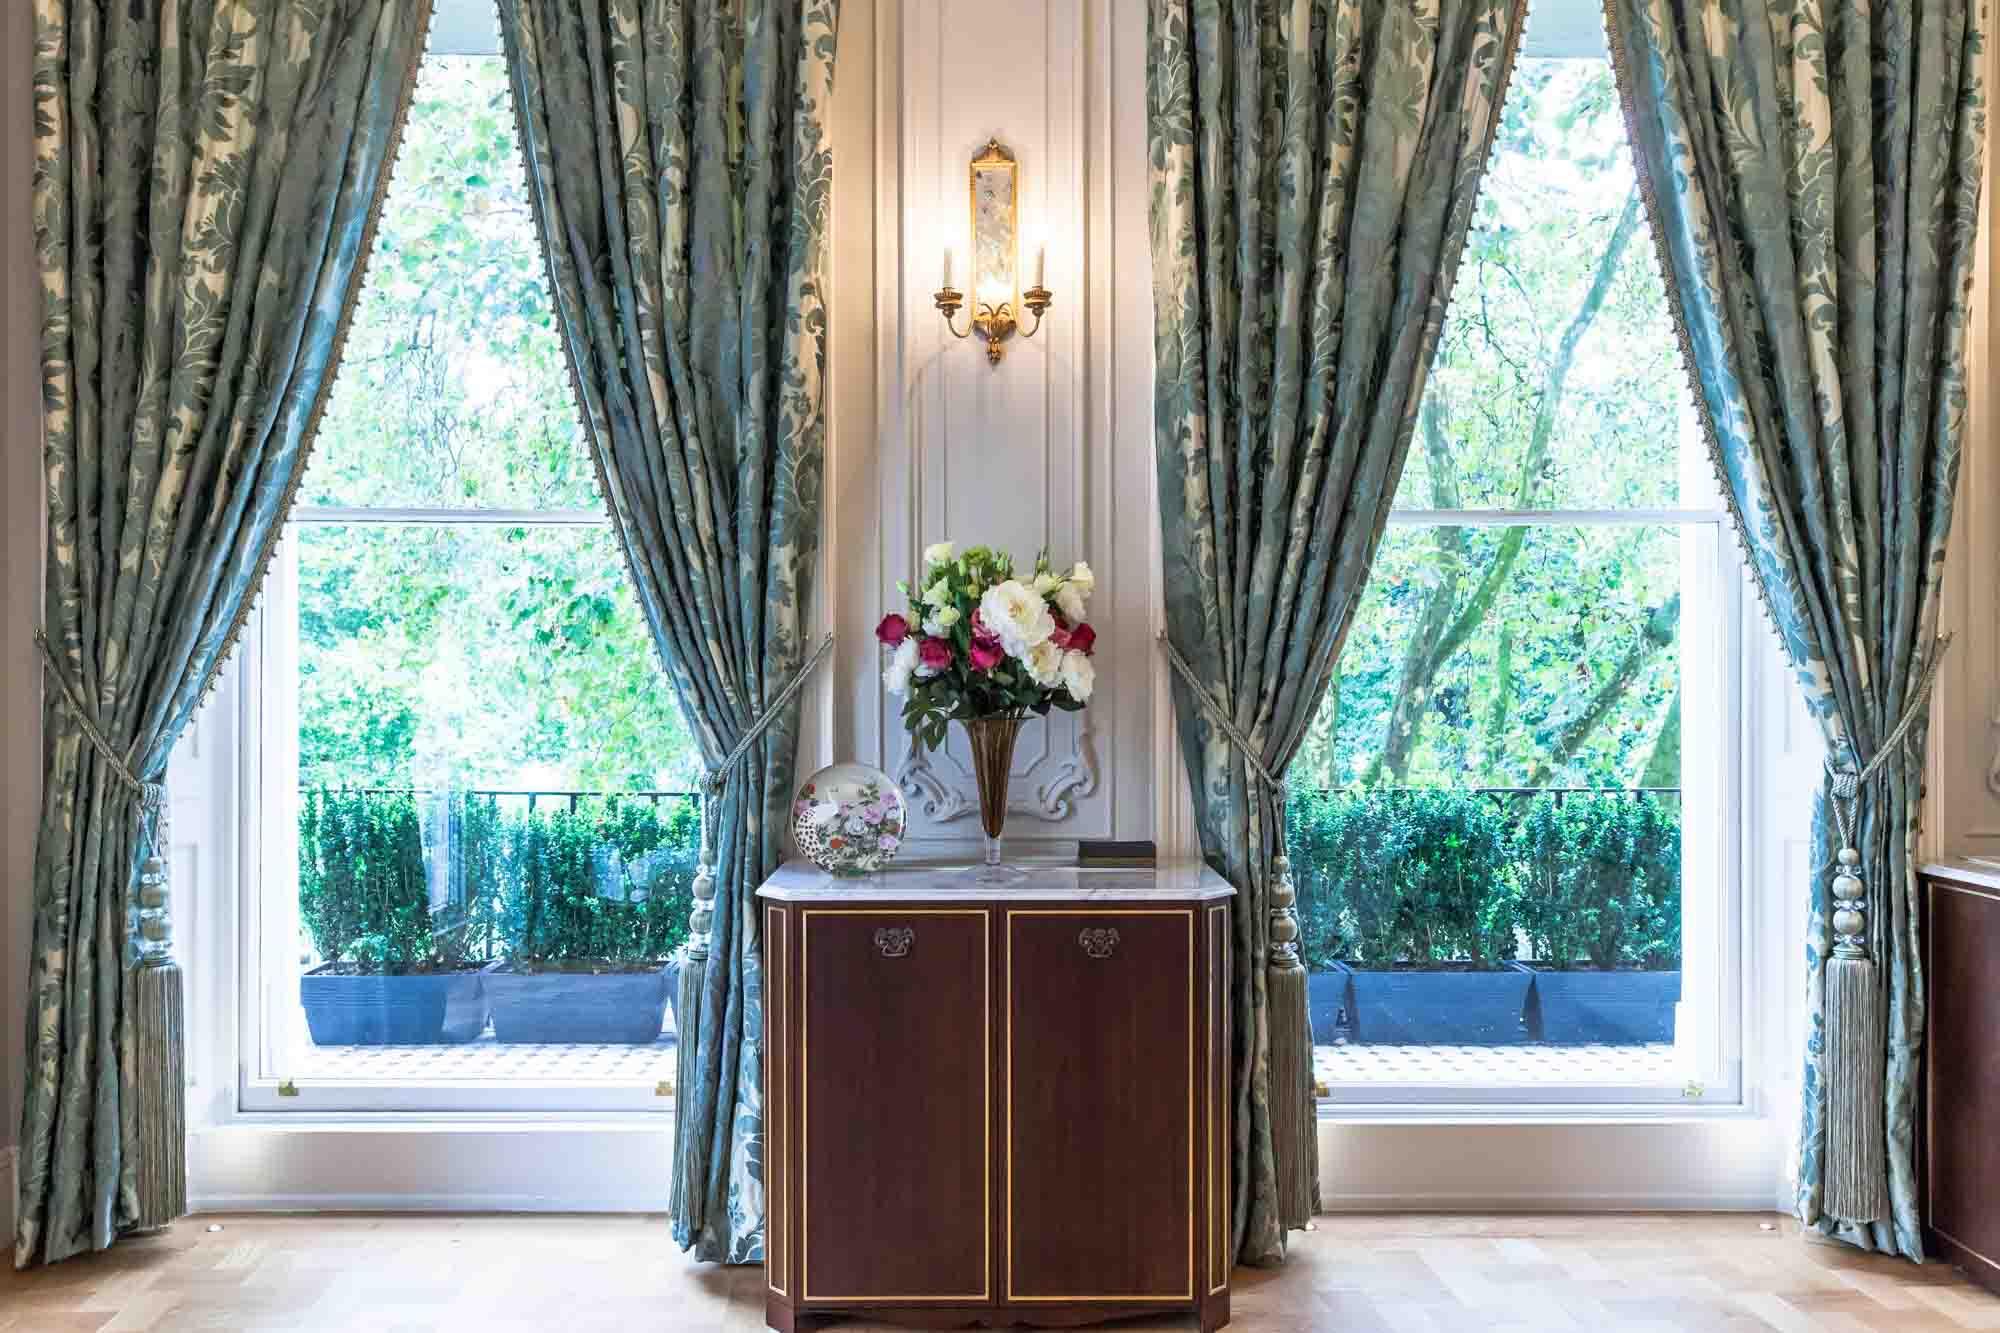 jonathan bond interior photographer, luxury cabinet by window, hyde park, london